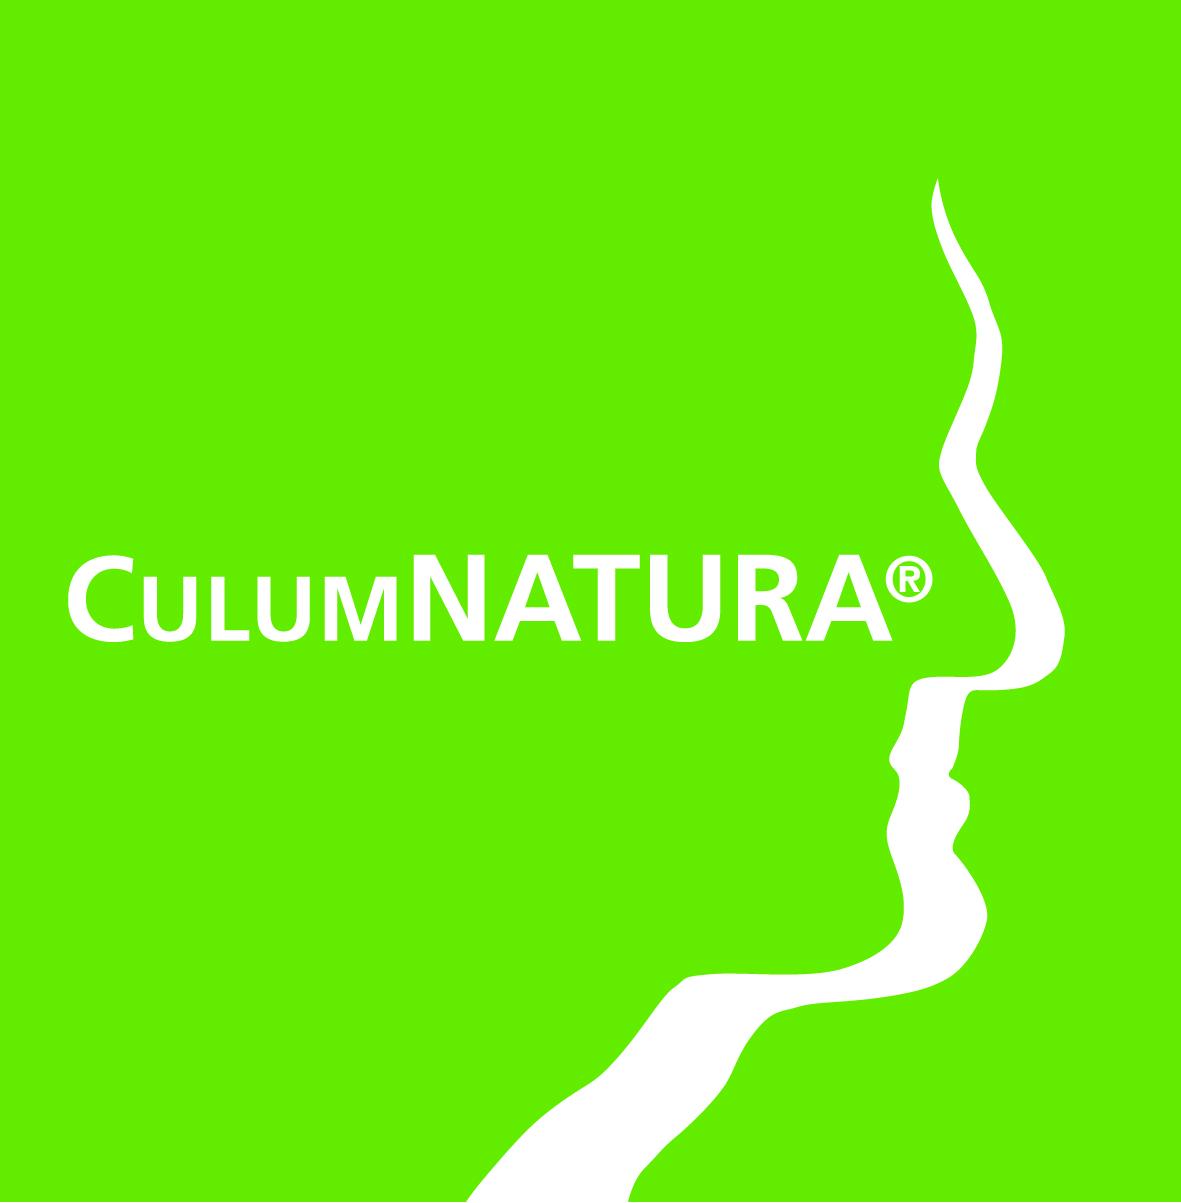 CULUMNATURA Wilhelm Luger GmbH